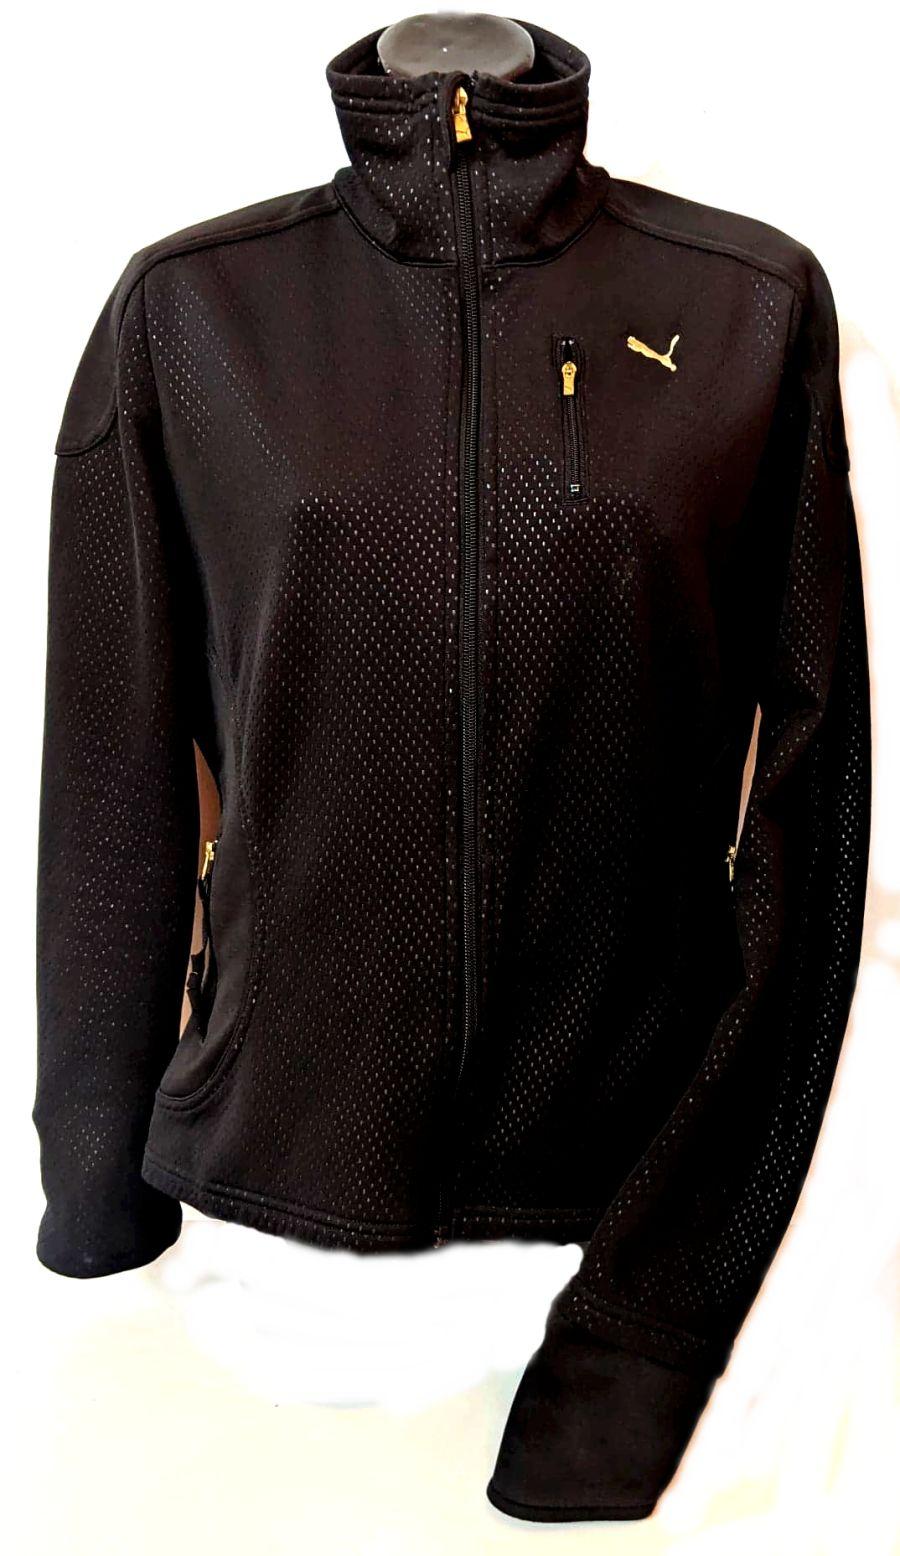 Vintage 1990's Black and Gold Puma Tracksuit Jacket